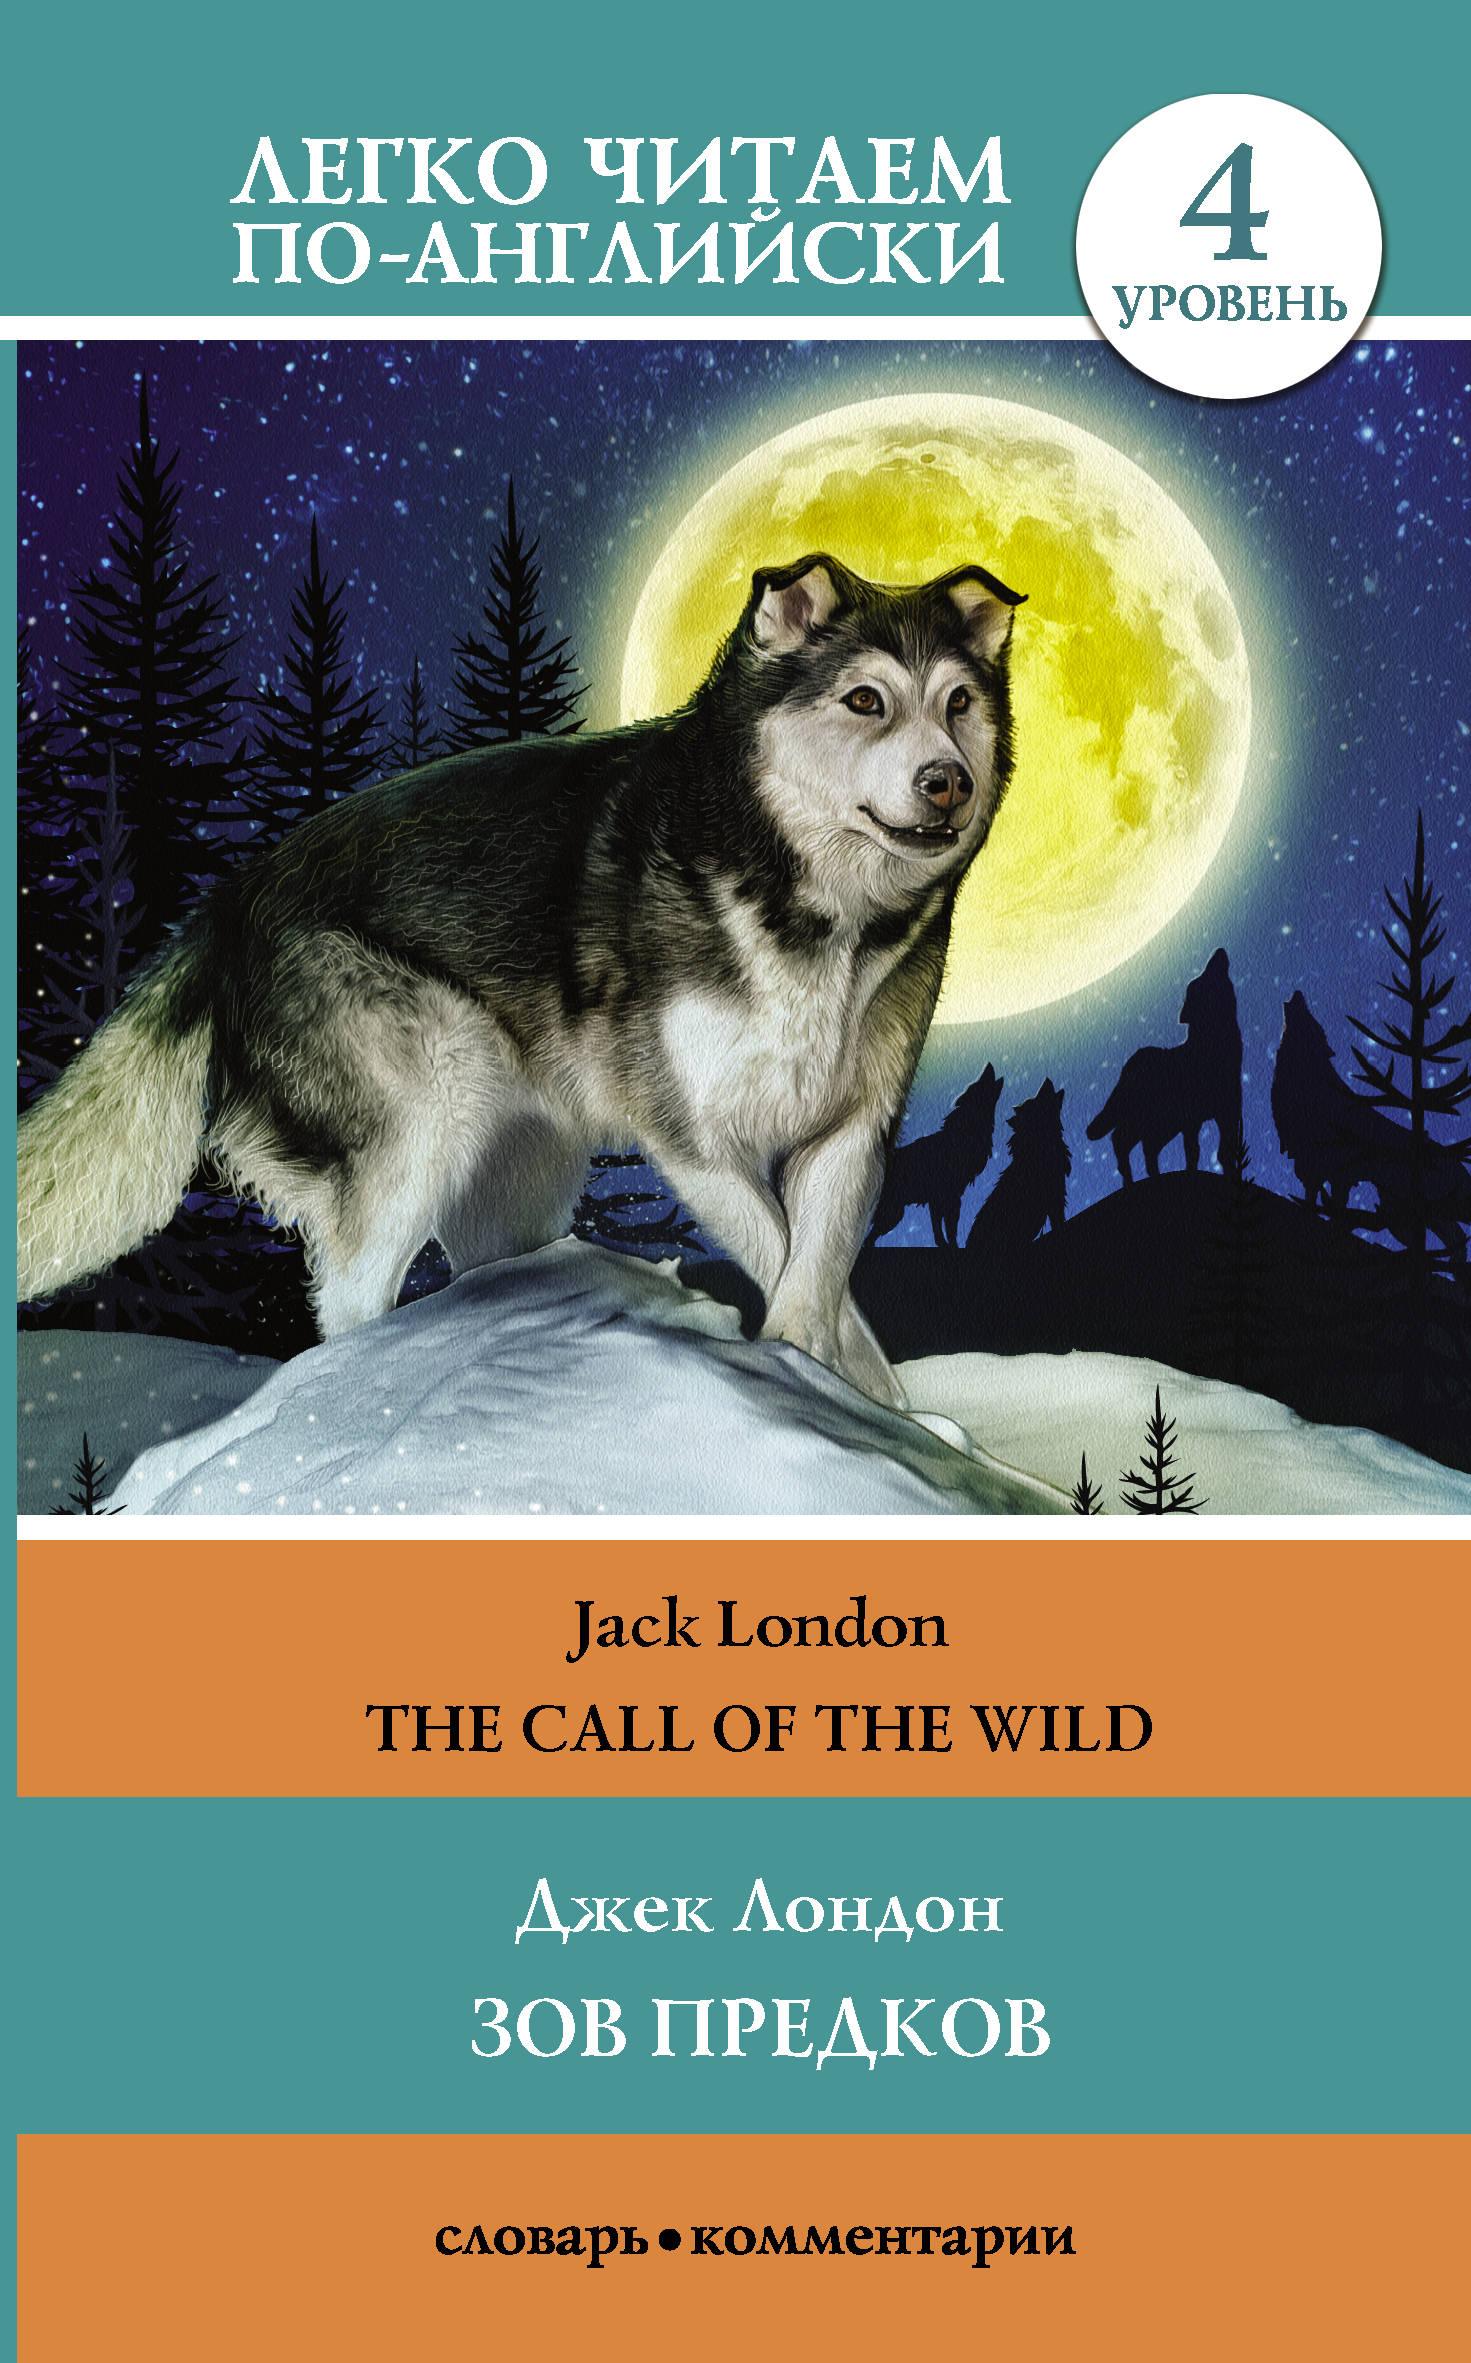 Джек Лондон Зов предков. Уровень 4 london j the call of the wild зов предков роман на англ яз london j